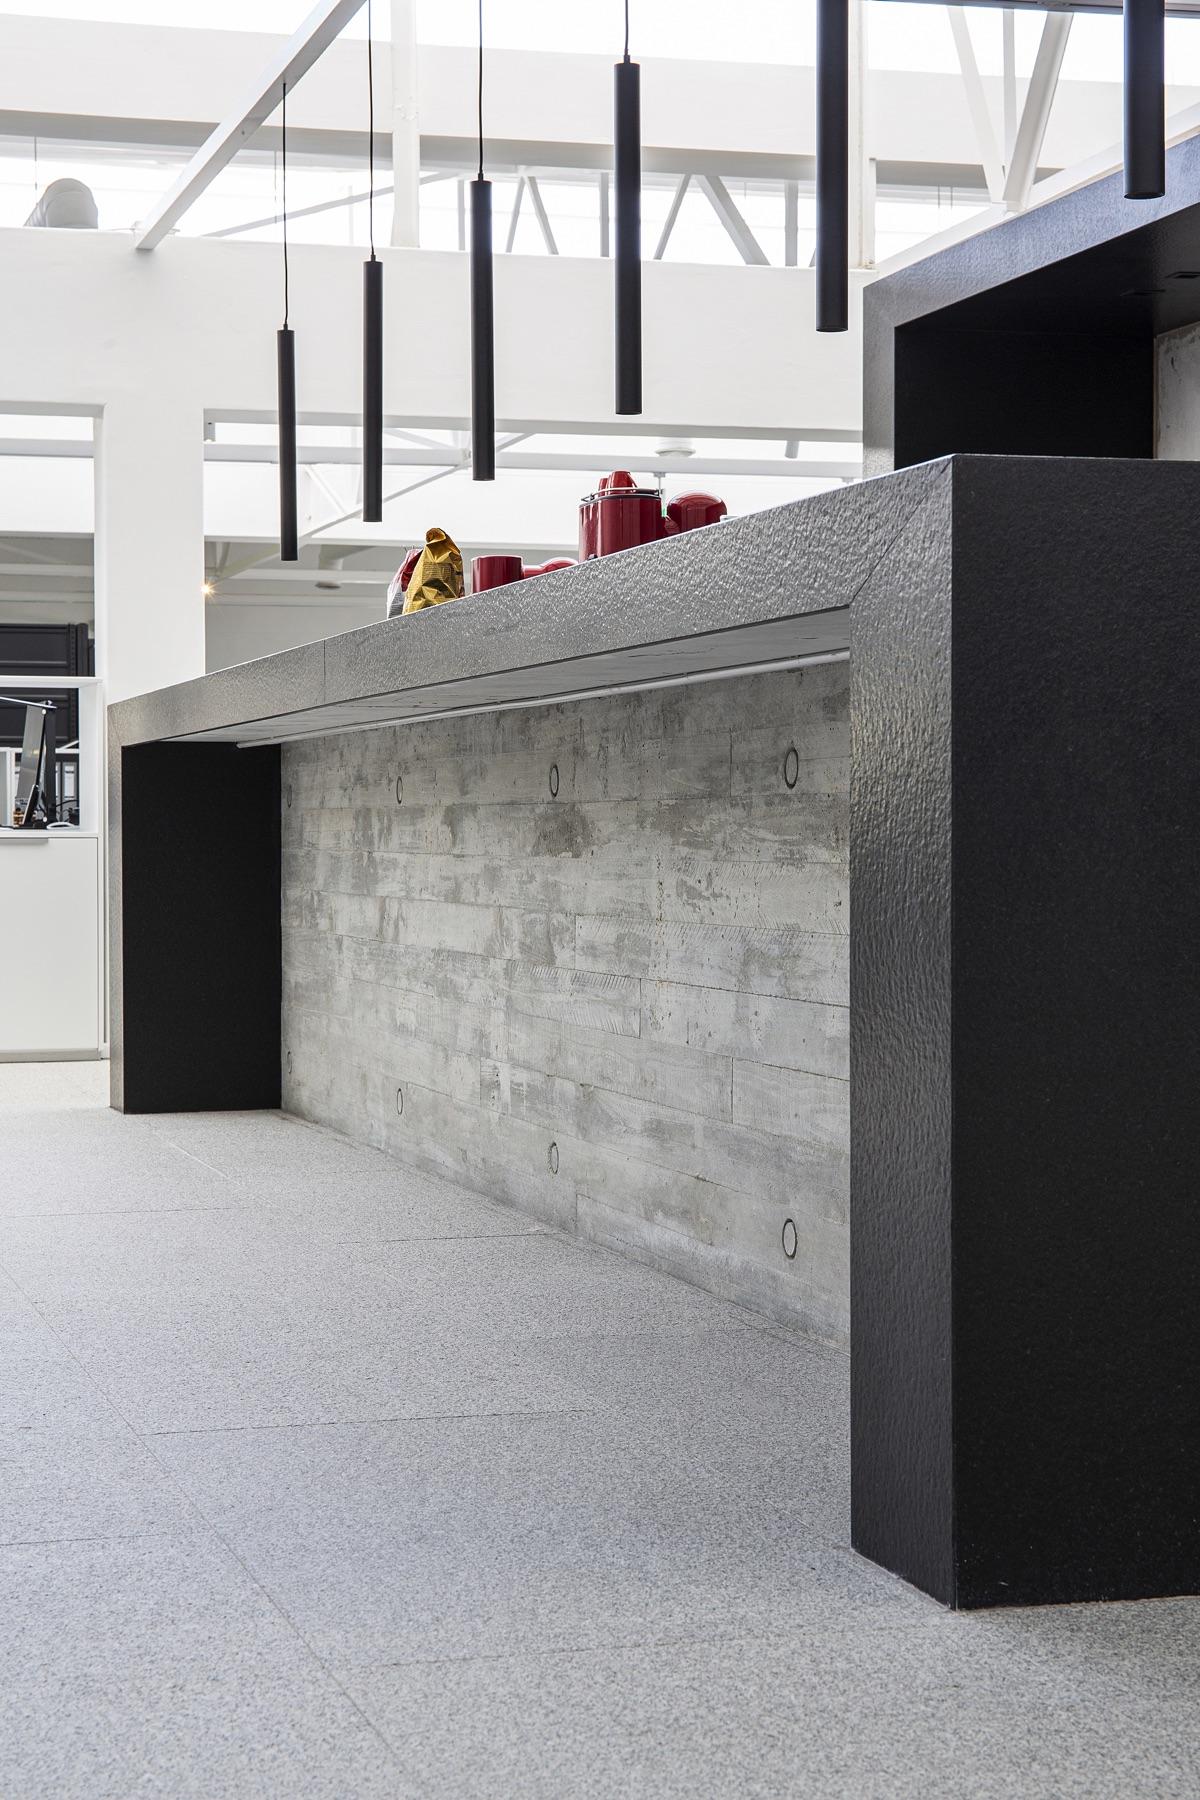 Artmart-Granite-Commercial-Project-1.jpg